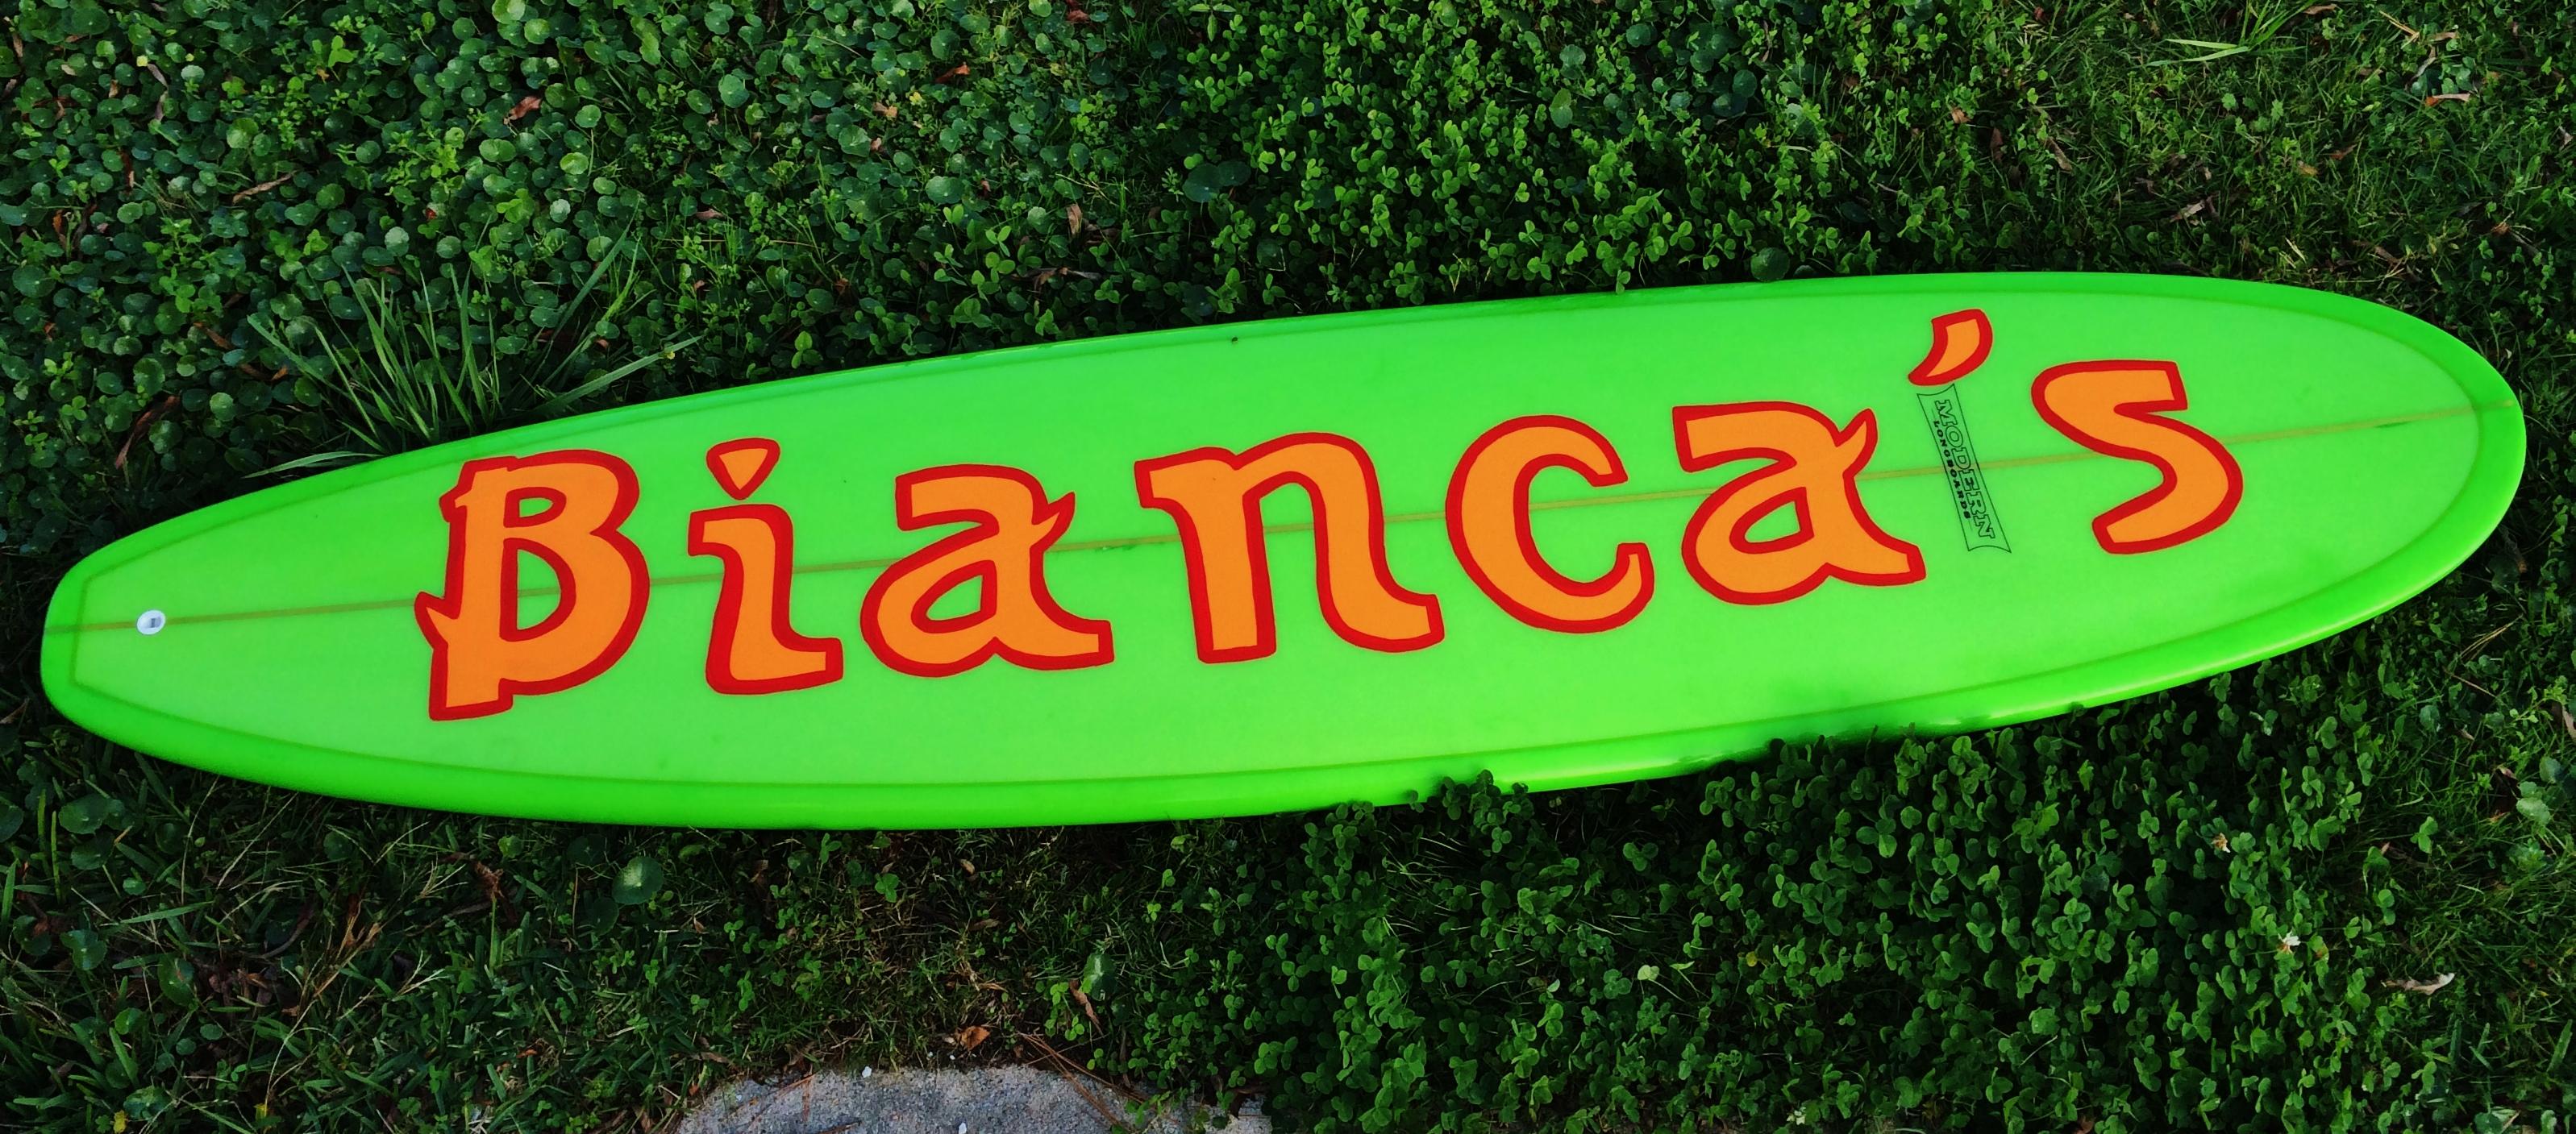 custom hand-painted surfboard